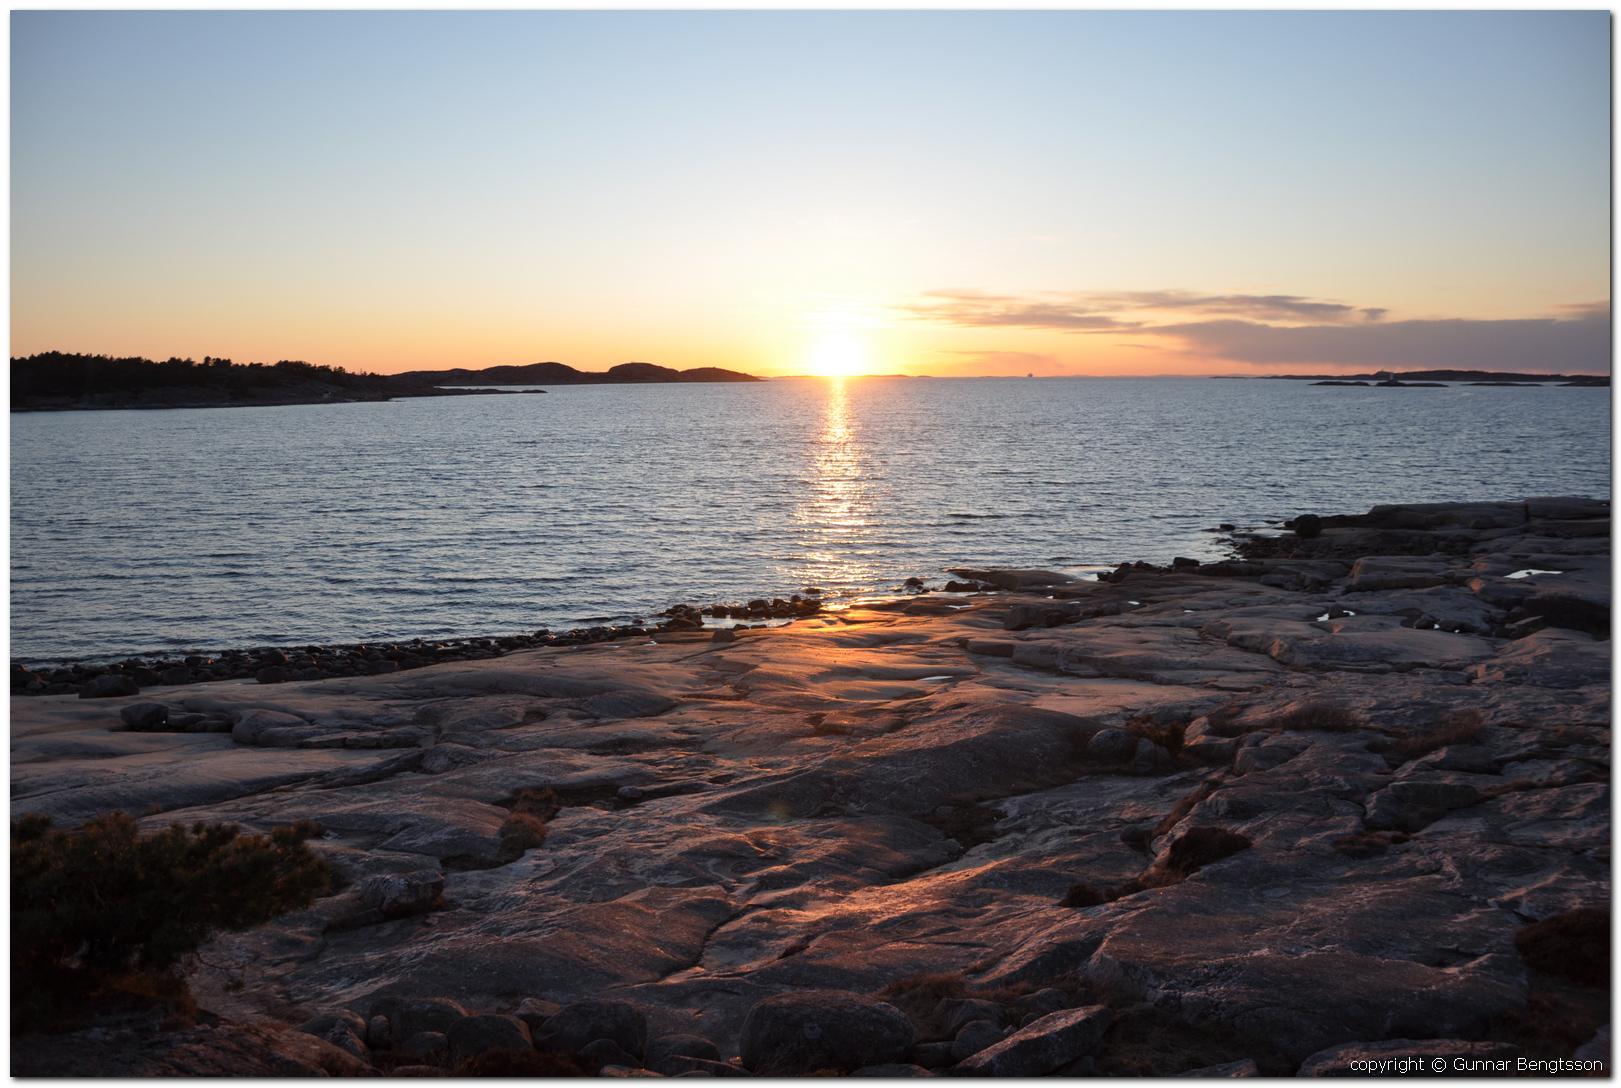 sunset_2012-04-03_dsc_3797